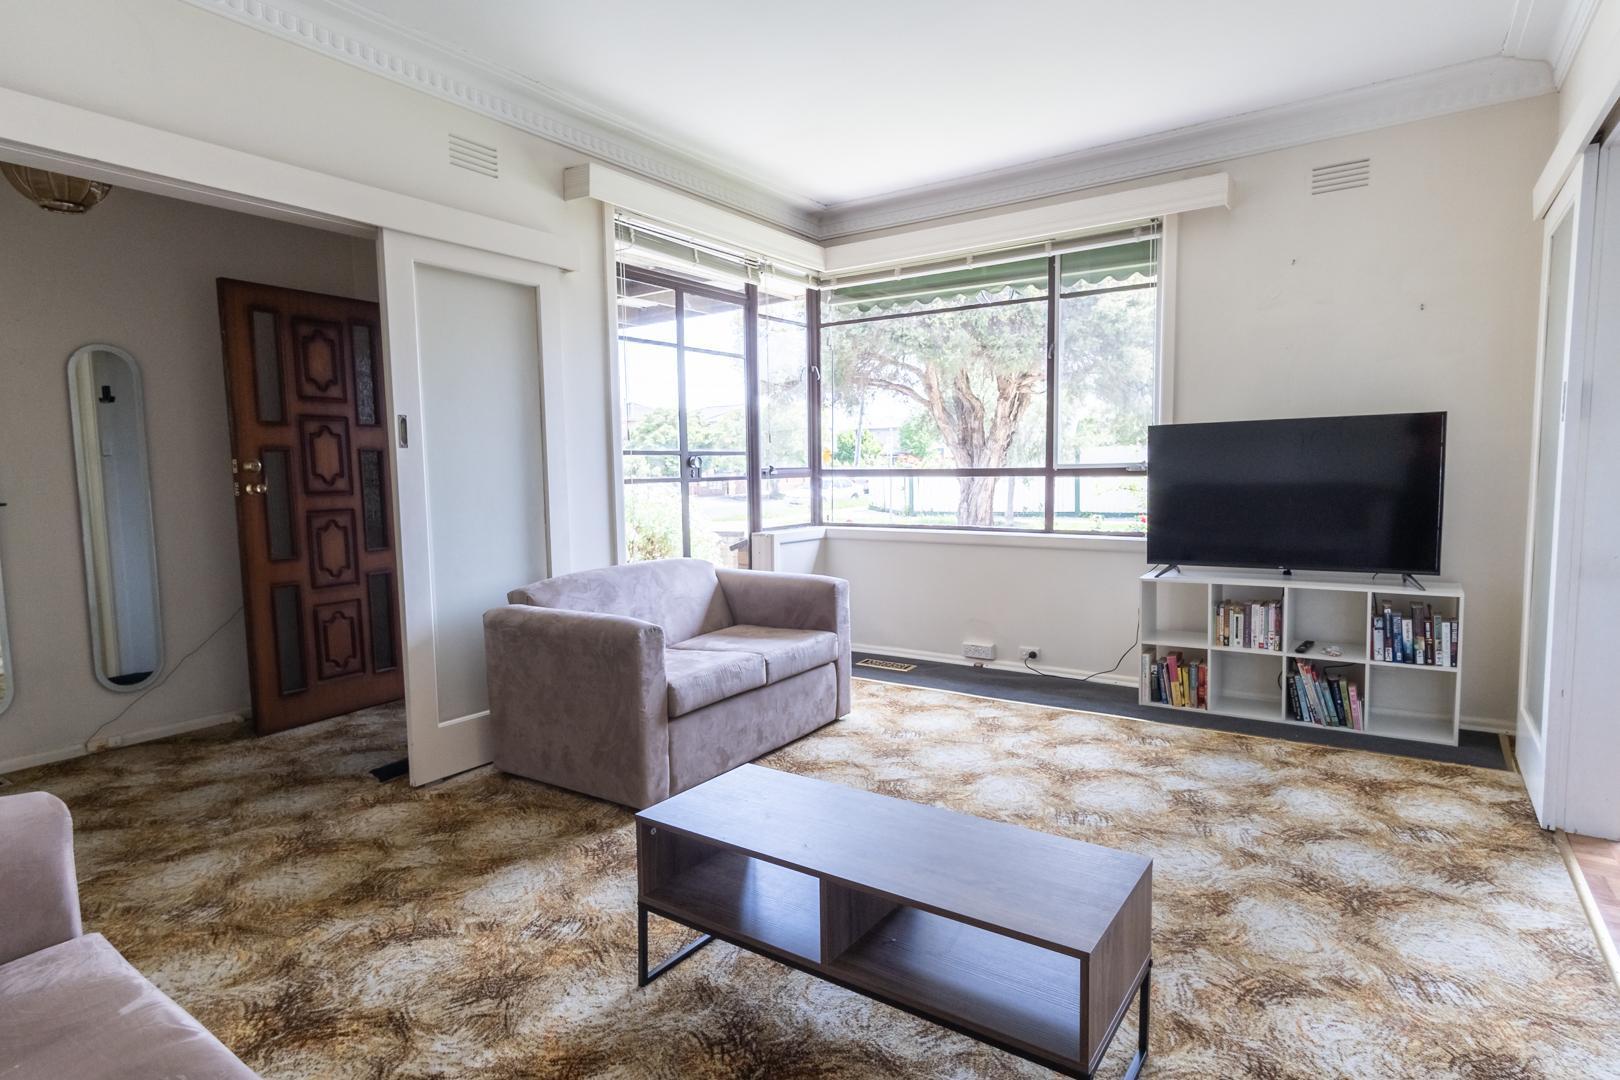 3 Bedroom Family House, Large Backyard, Netflix